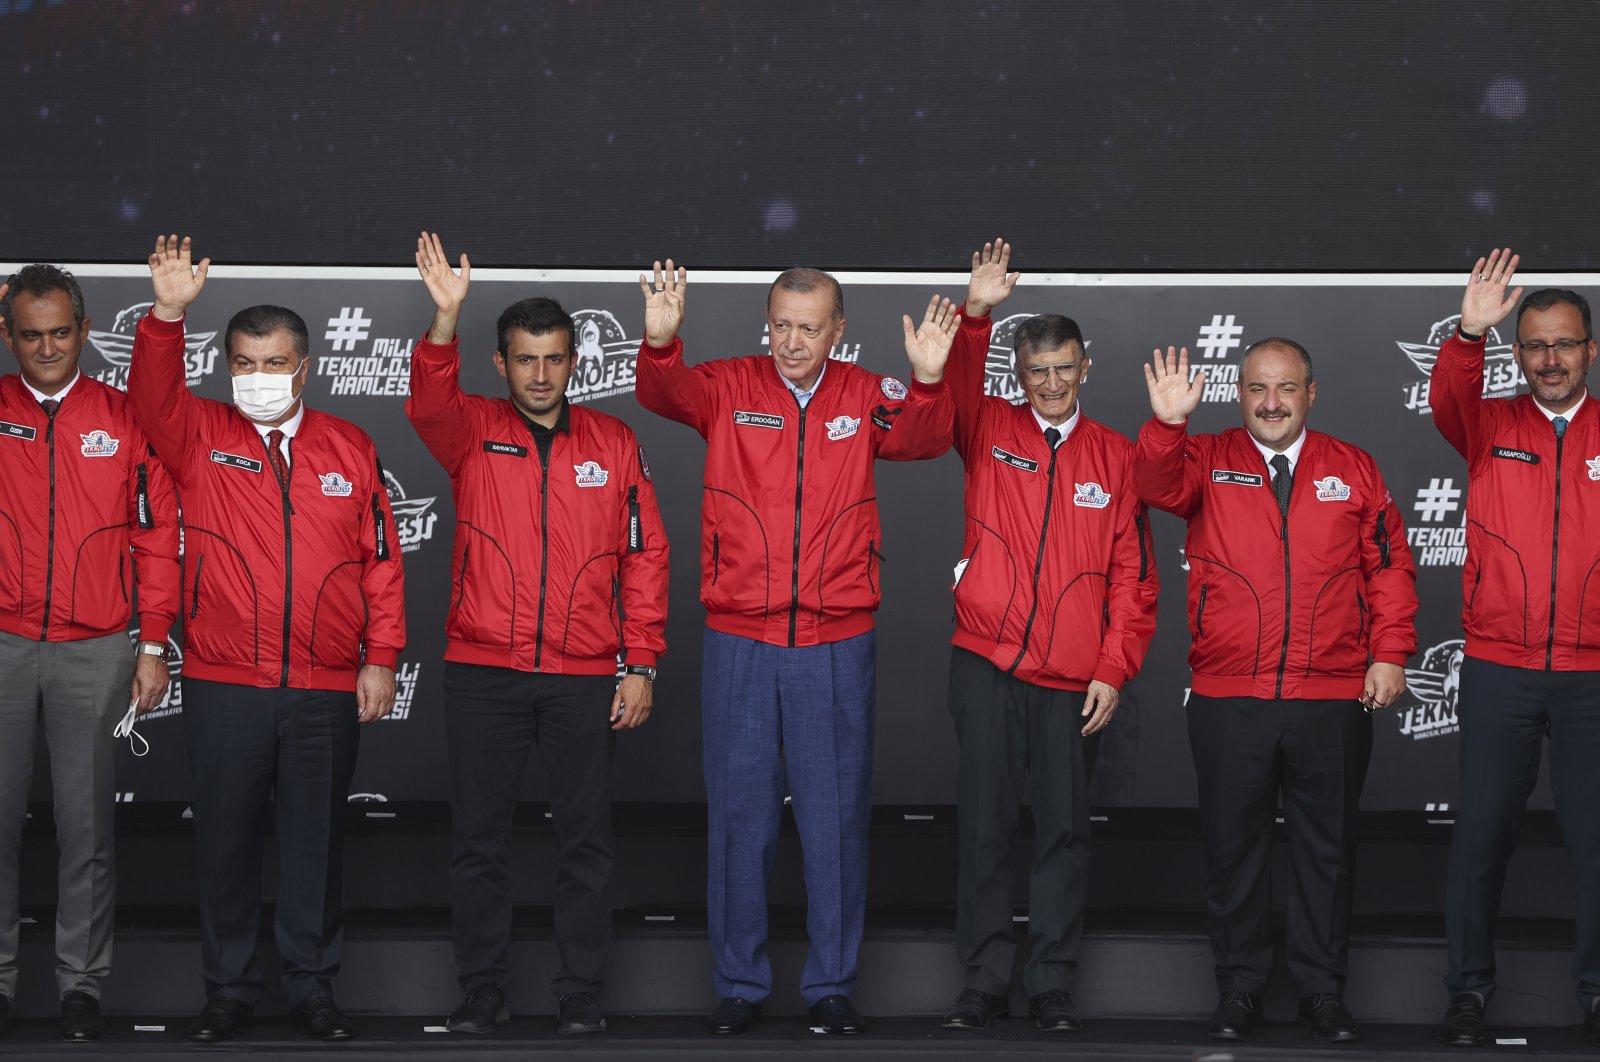 President Recep Tayyip Erdoğan (C) attends Teknofest, Istanbul, Turkey, Sept. 25, 2021. (Anadolu Agency)